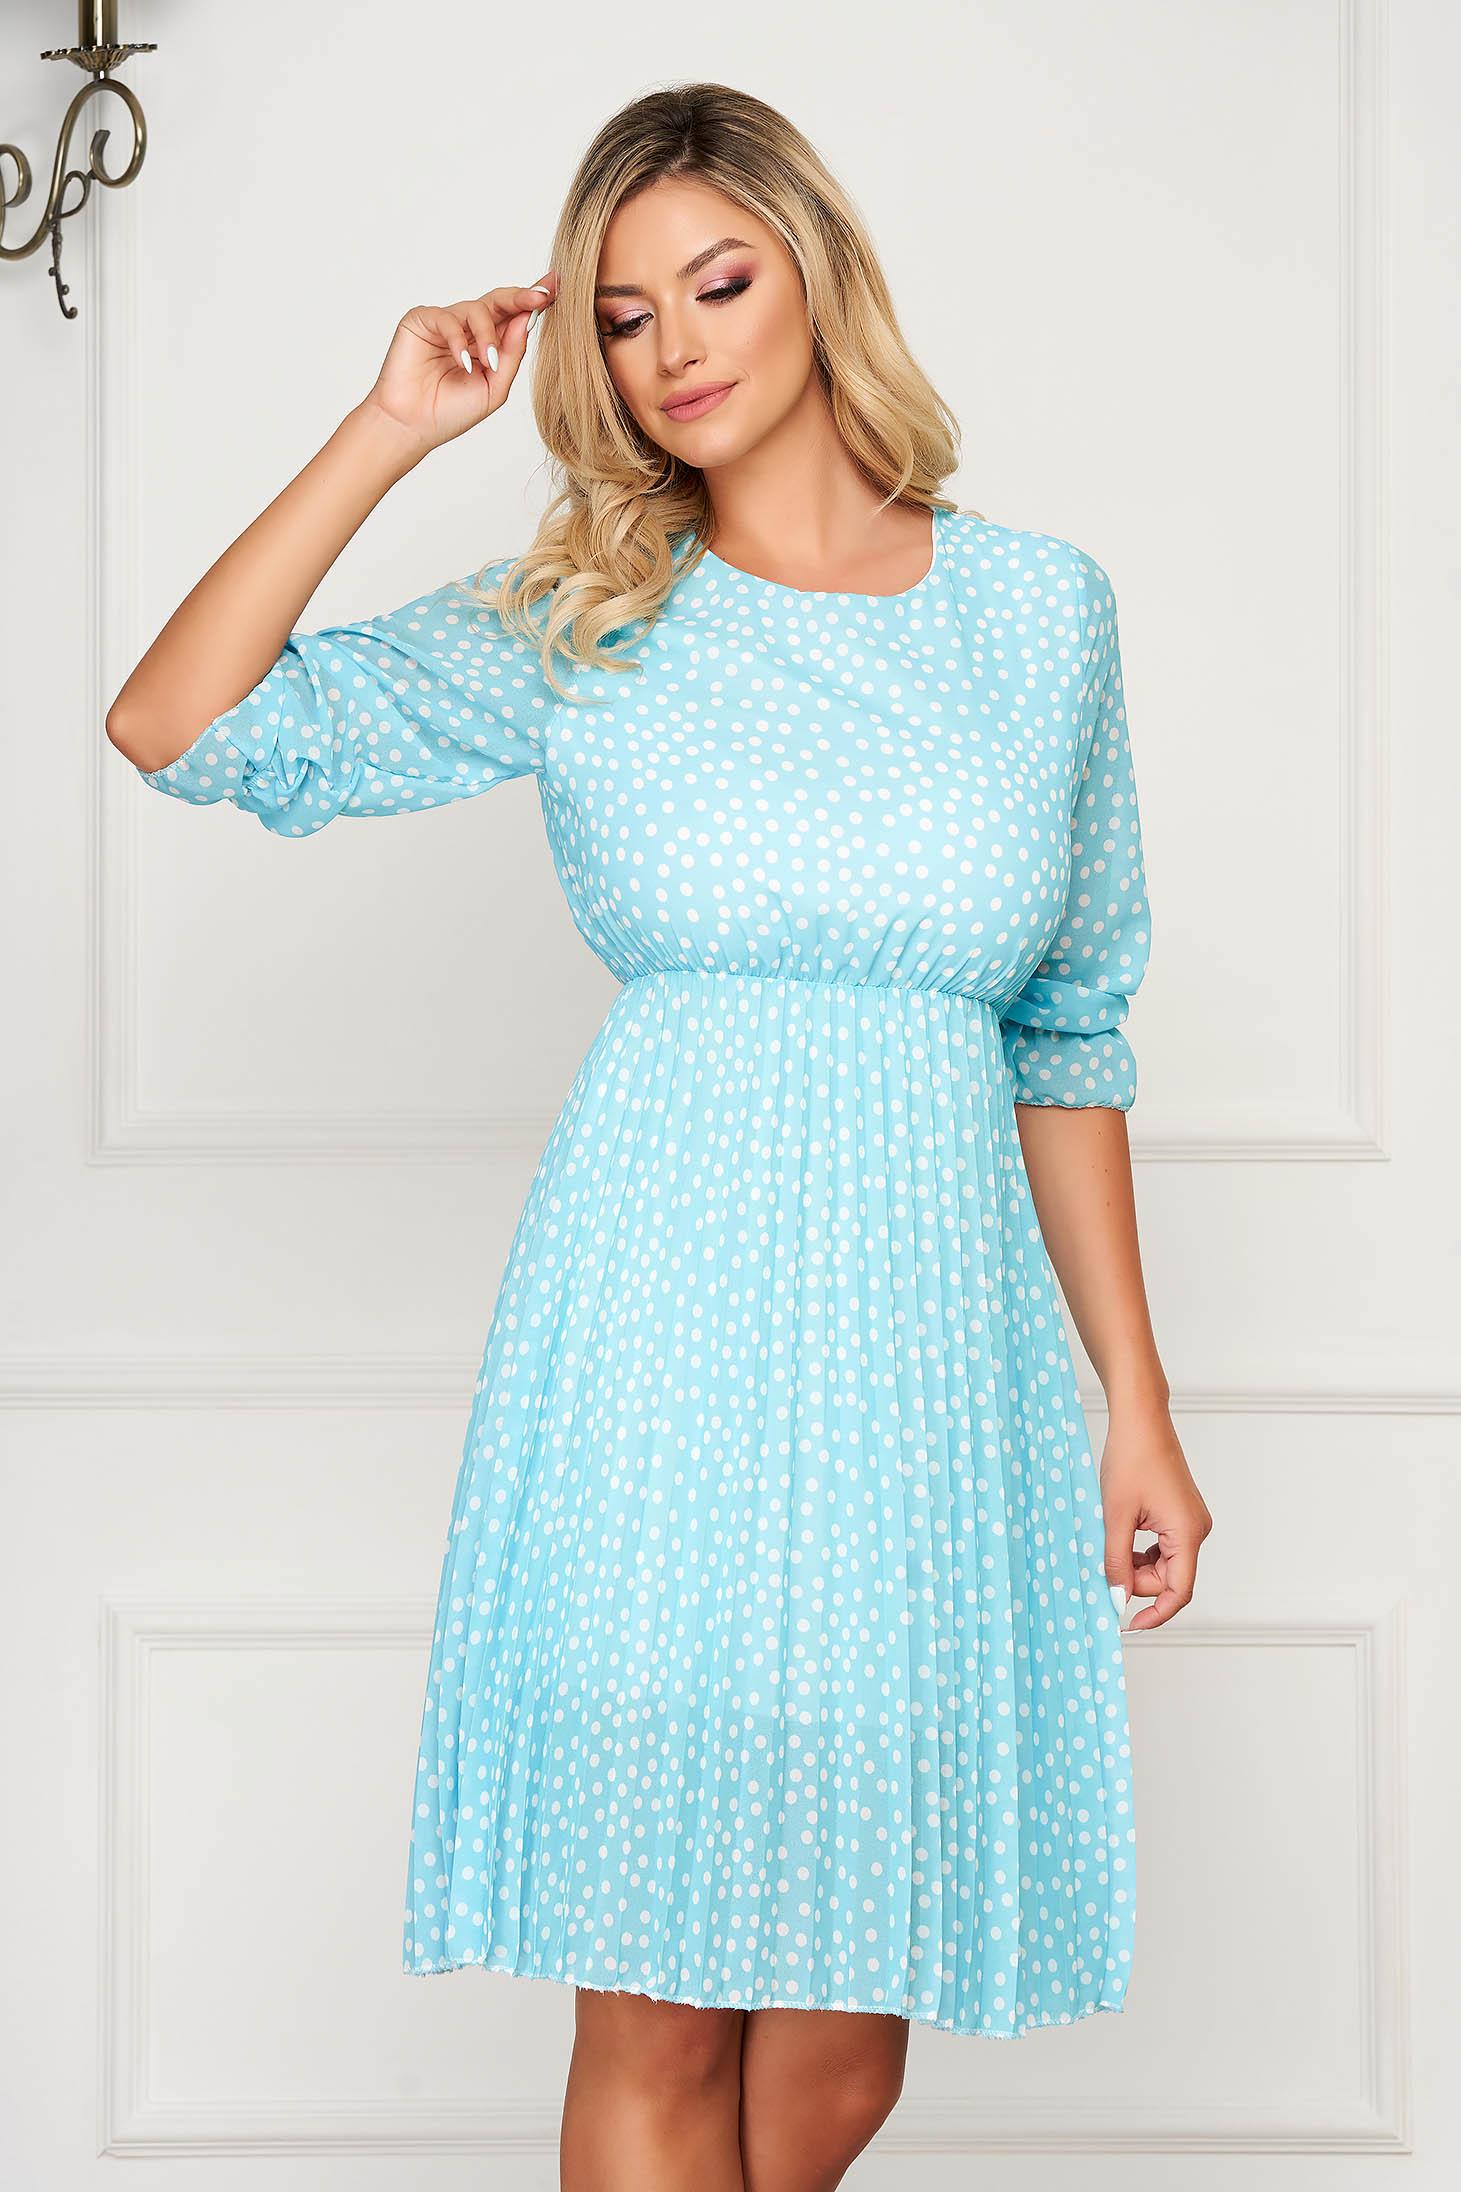 Lightblue dress short cut daily from veil fabric cloche with elastic waist dots print